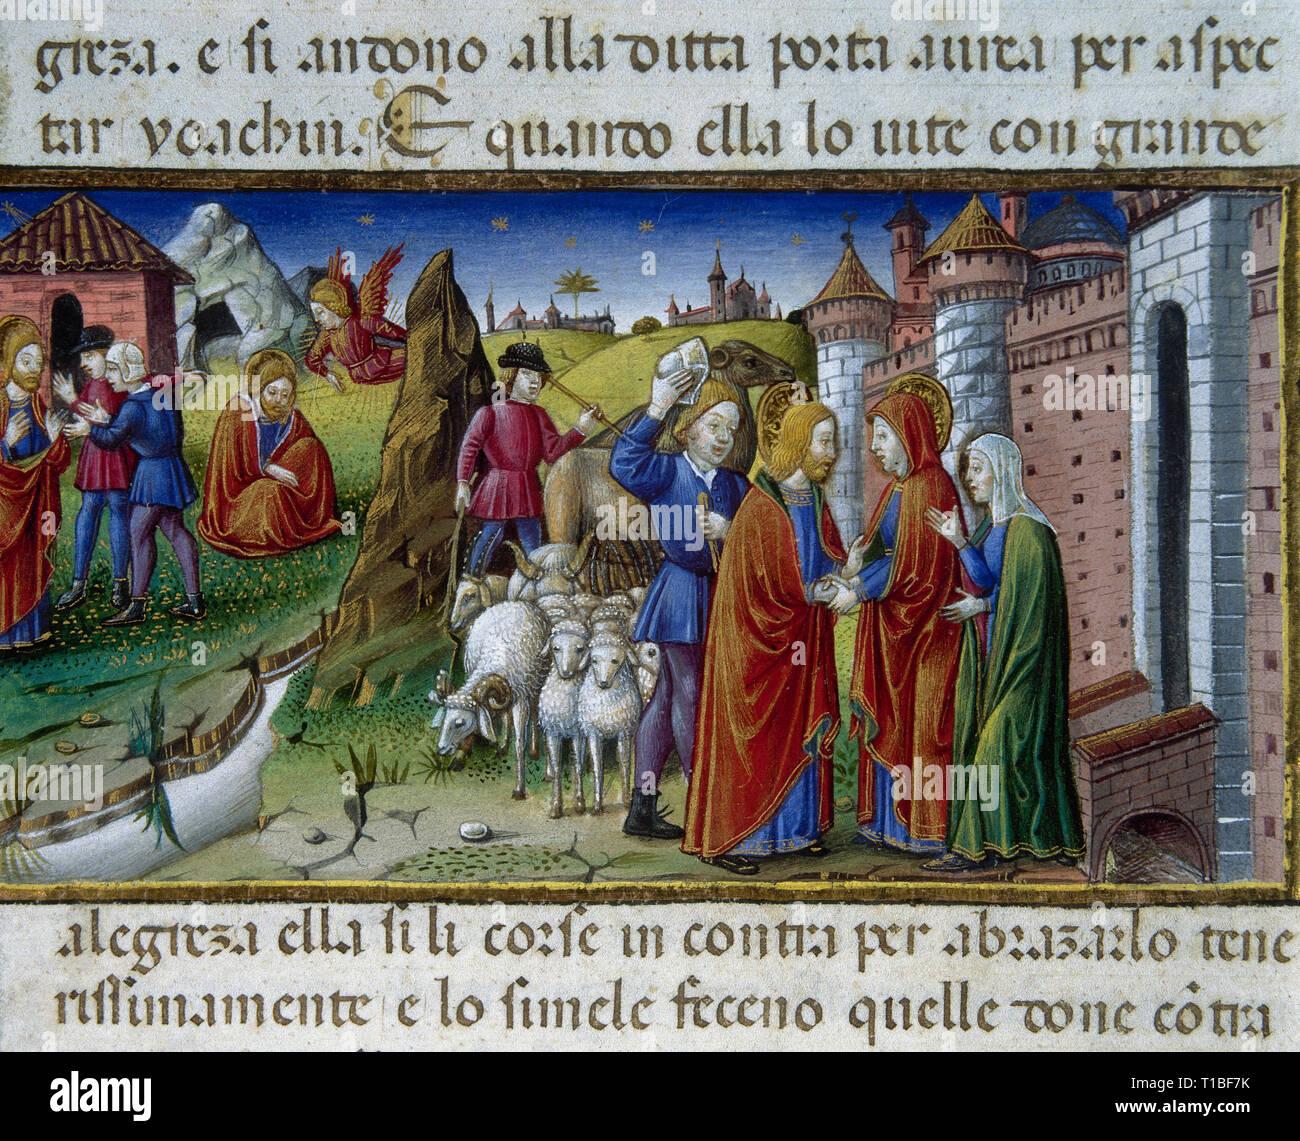 Cristofor de Predis (1440-1486). Italian miniaturist. Miniature depicting the encounter between Saint Anne and Saint Joachim. Codex de Predis, 1476. Royal Library. Turin. Italy. - Stock Image